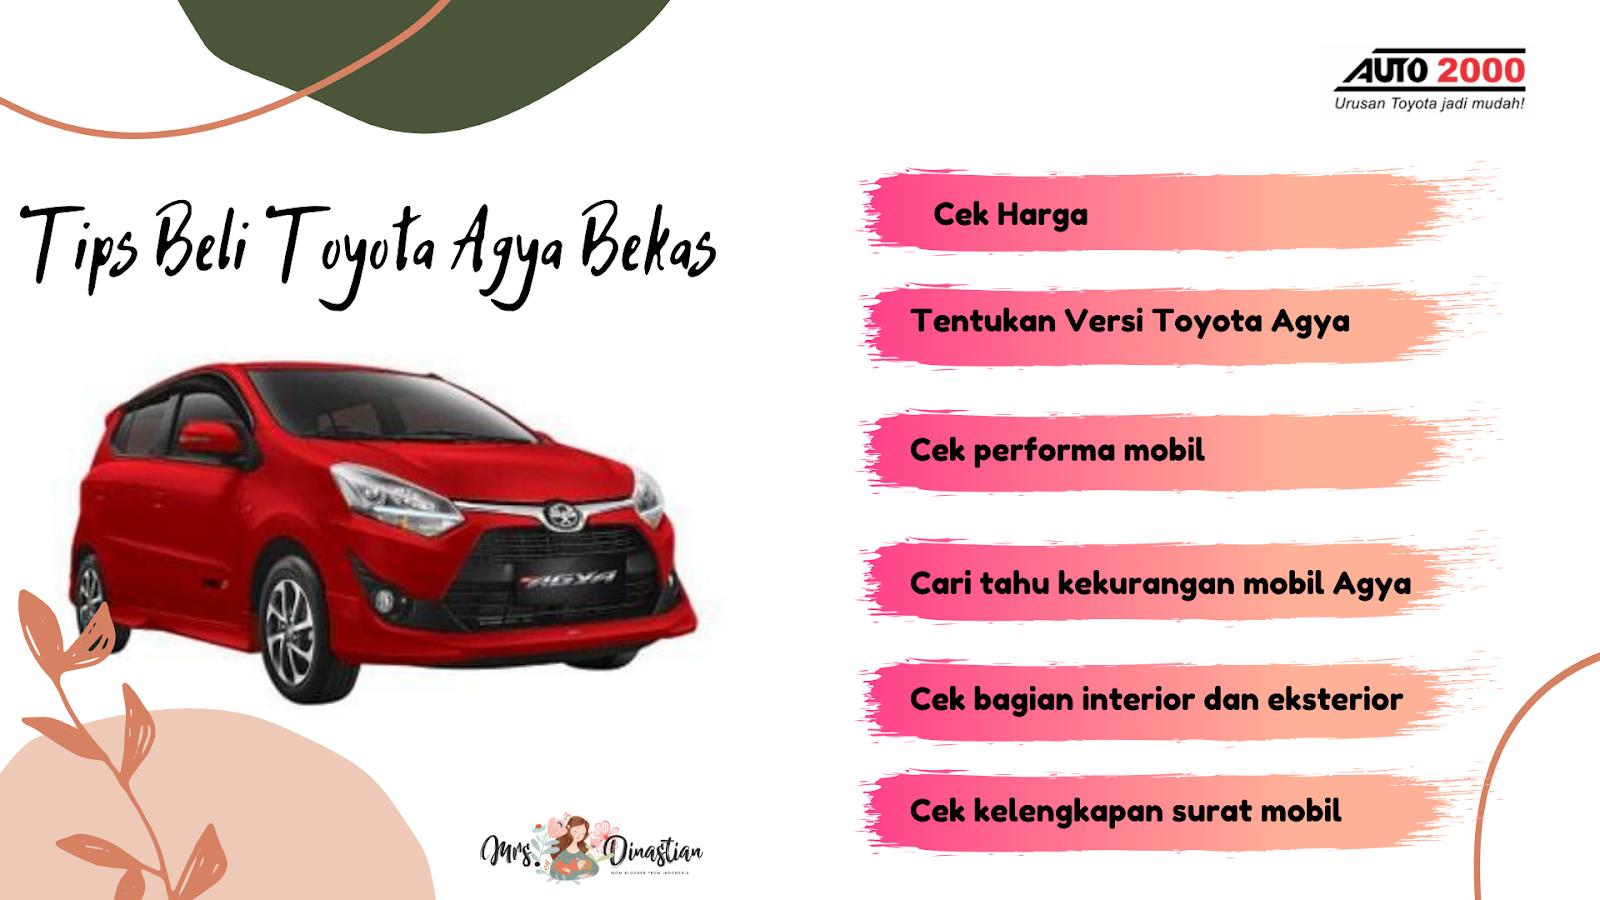 Tips Beli Toyota Agya Bekas